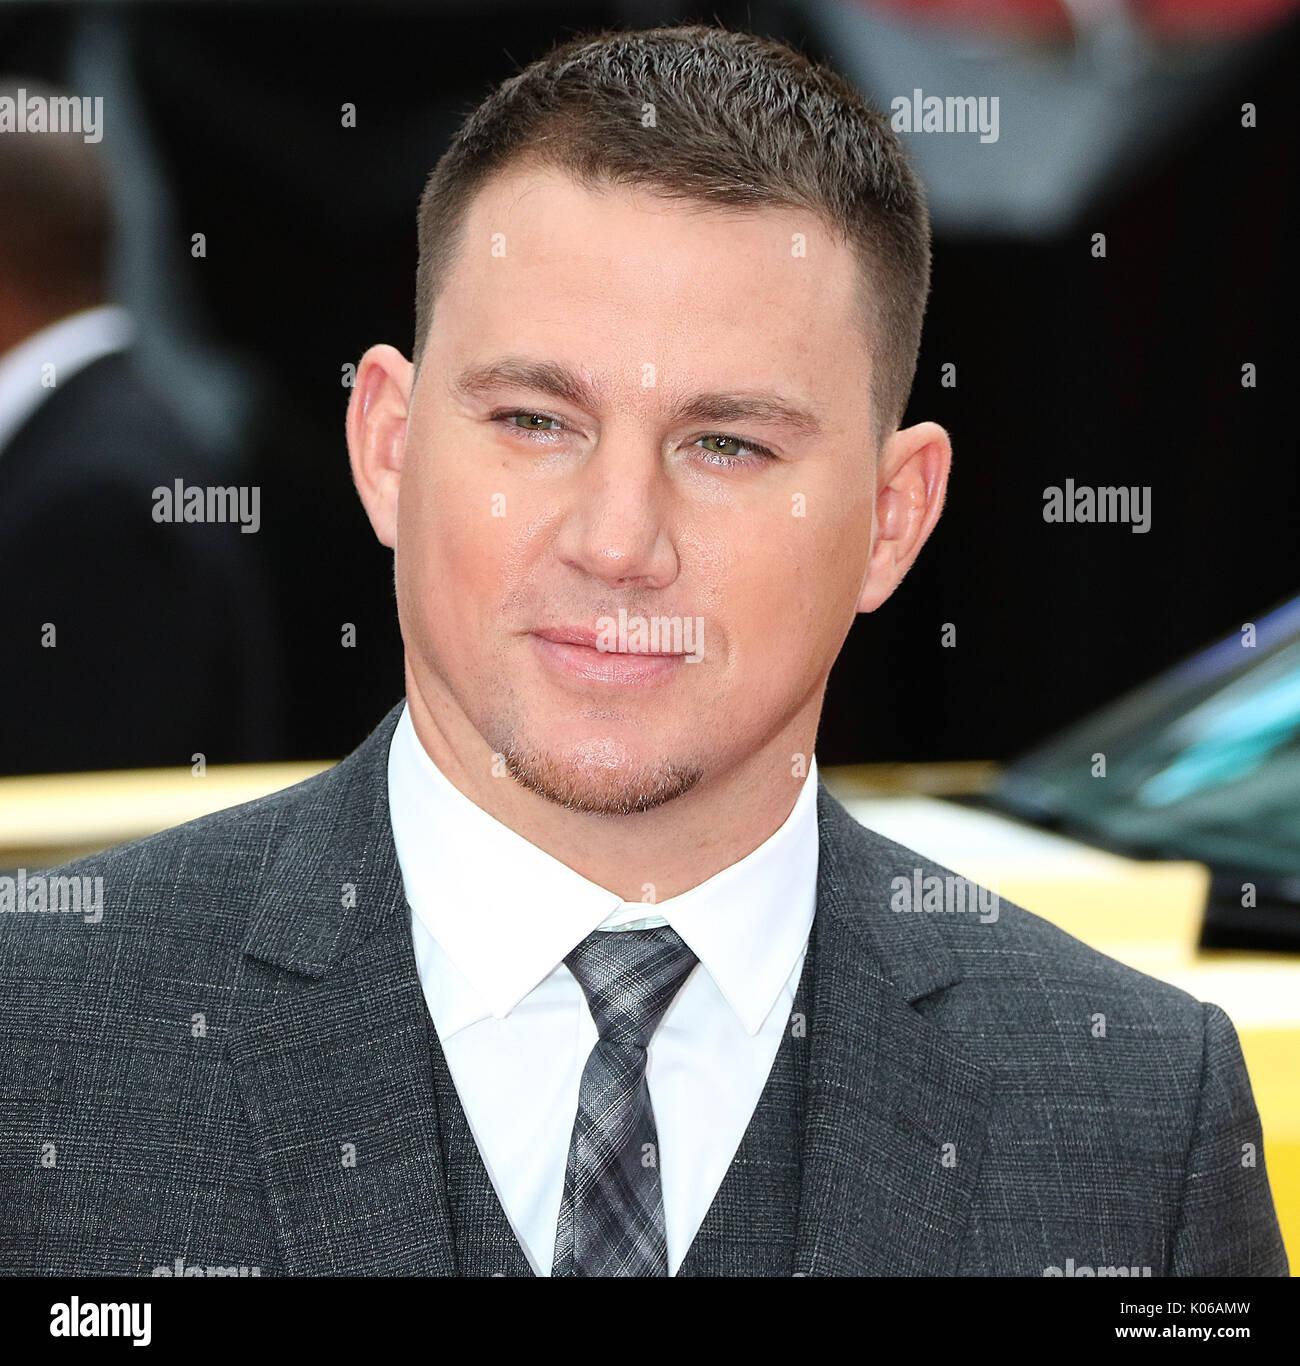 London, Großbritannien. 21 Aug, 2017. Channing Tatum, Logan Lucky-UK Film Premiere, Leicester Square, London, Großbritannien, Stockfoto